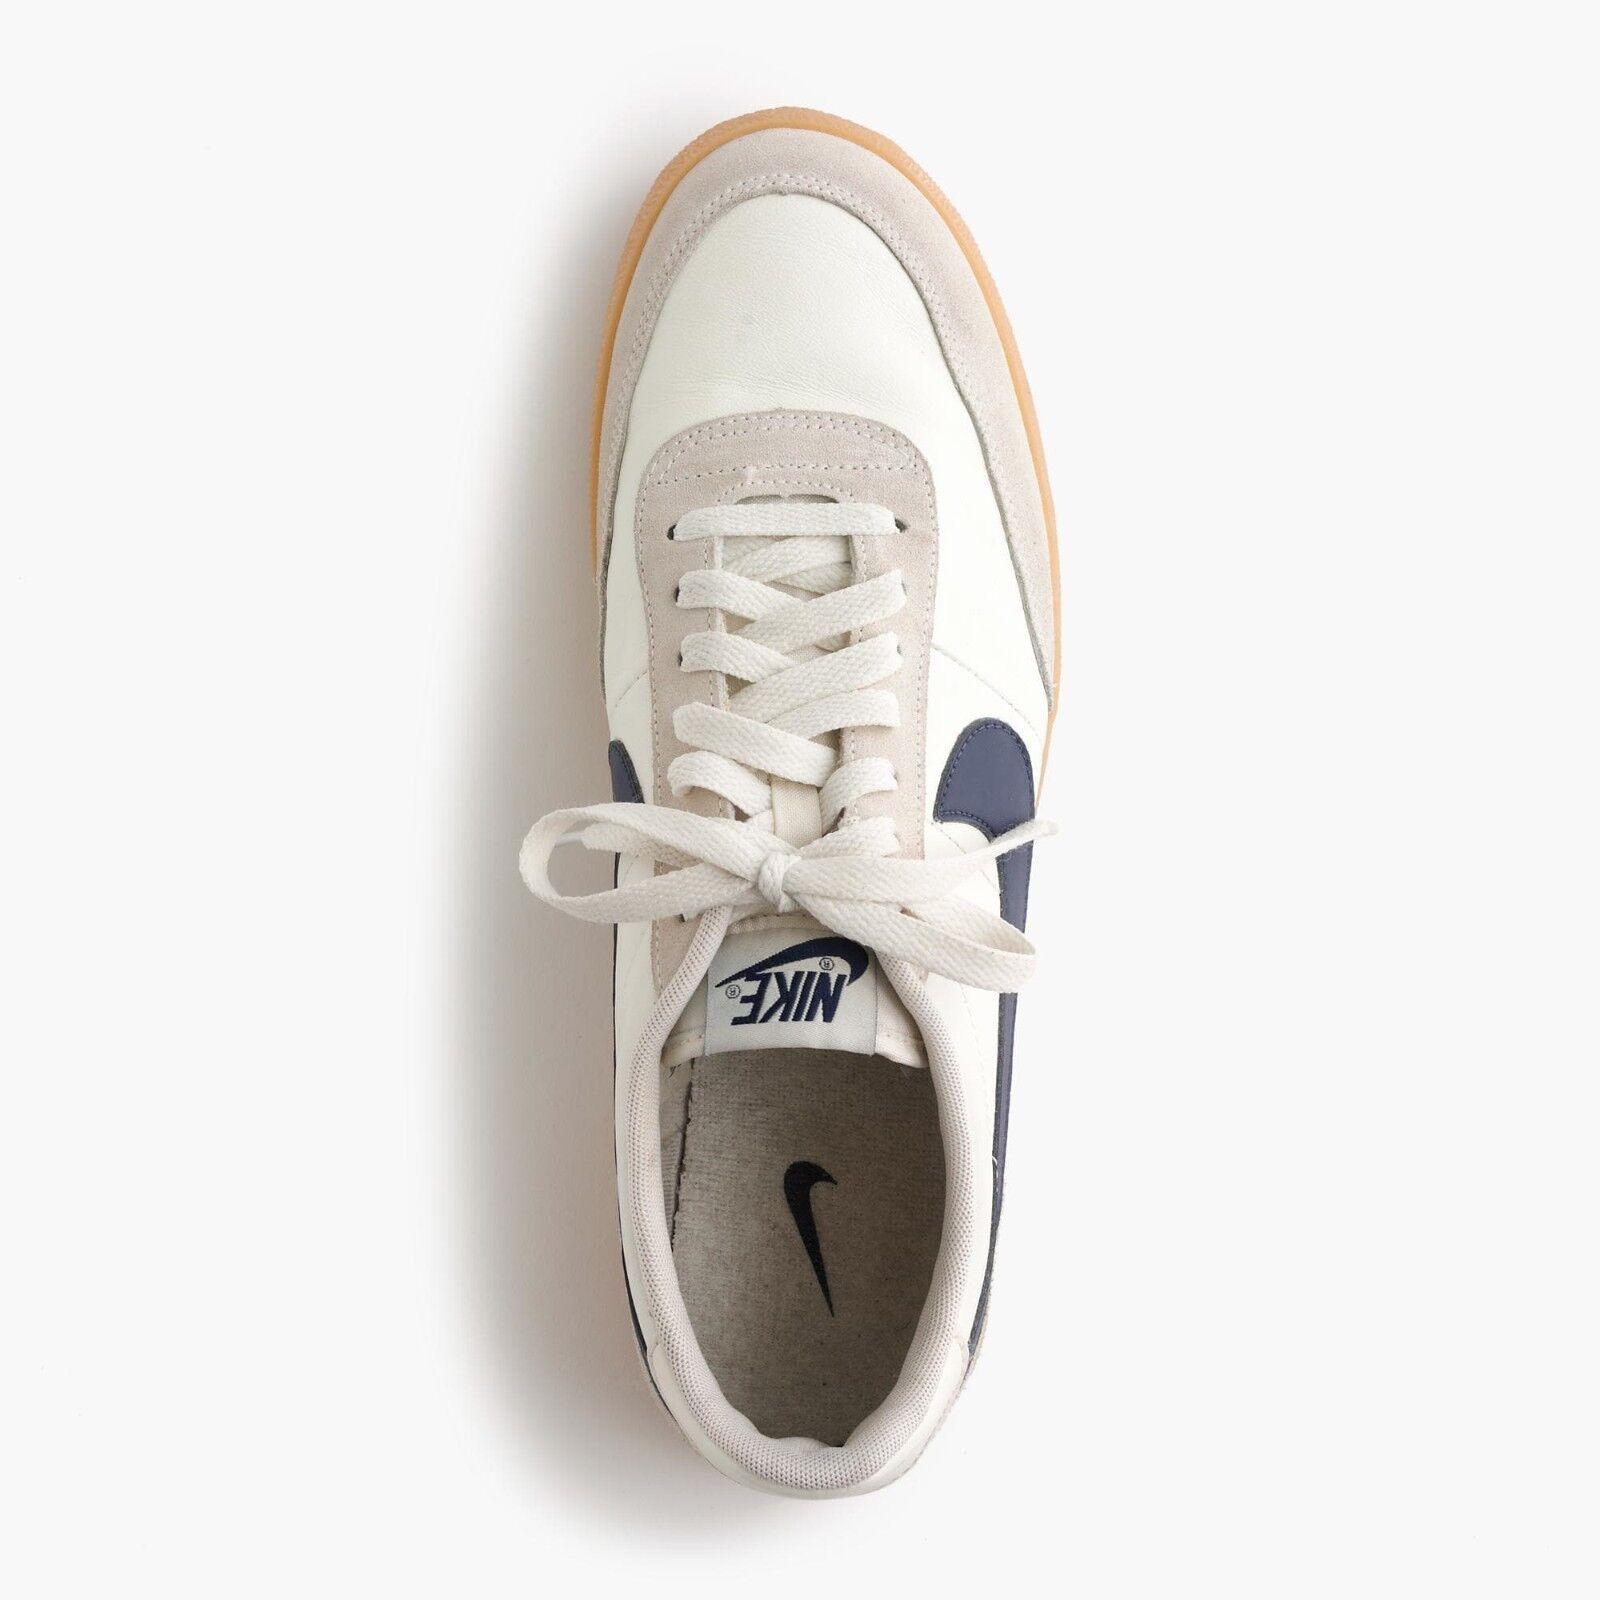 NEW w/ Box Nike x Sneakers J.Crew Killshot 2 Leather Sneakers x 69895f